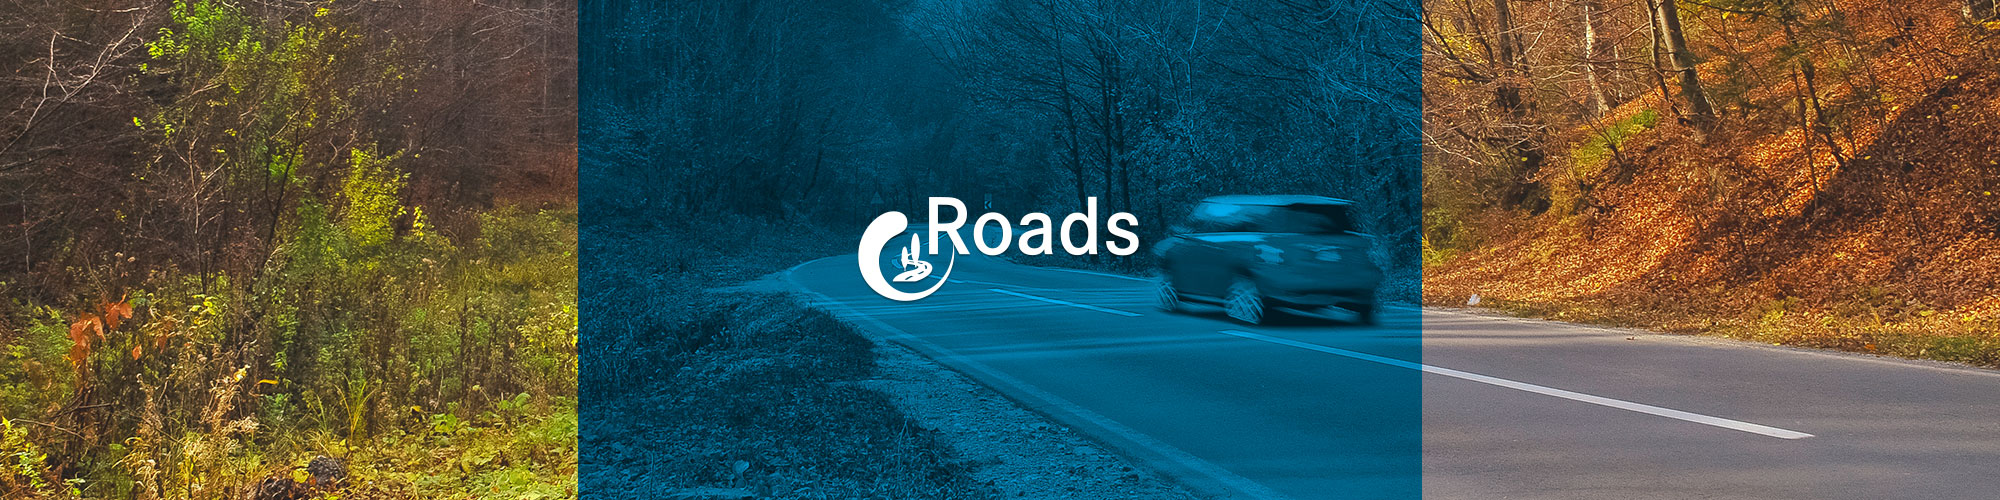 Ingeea Roads